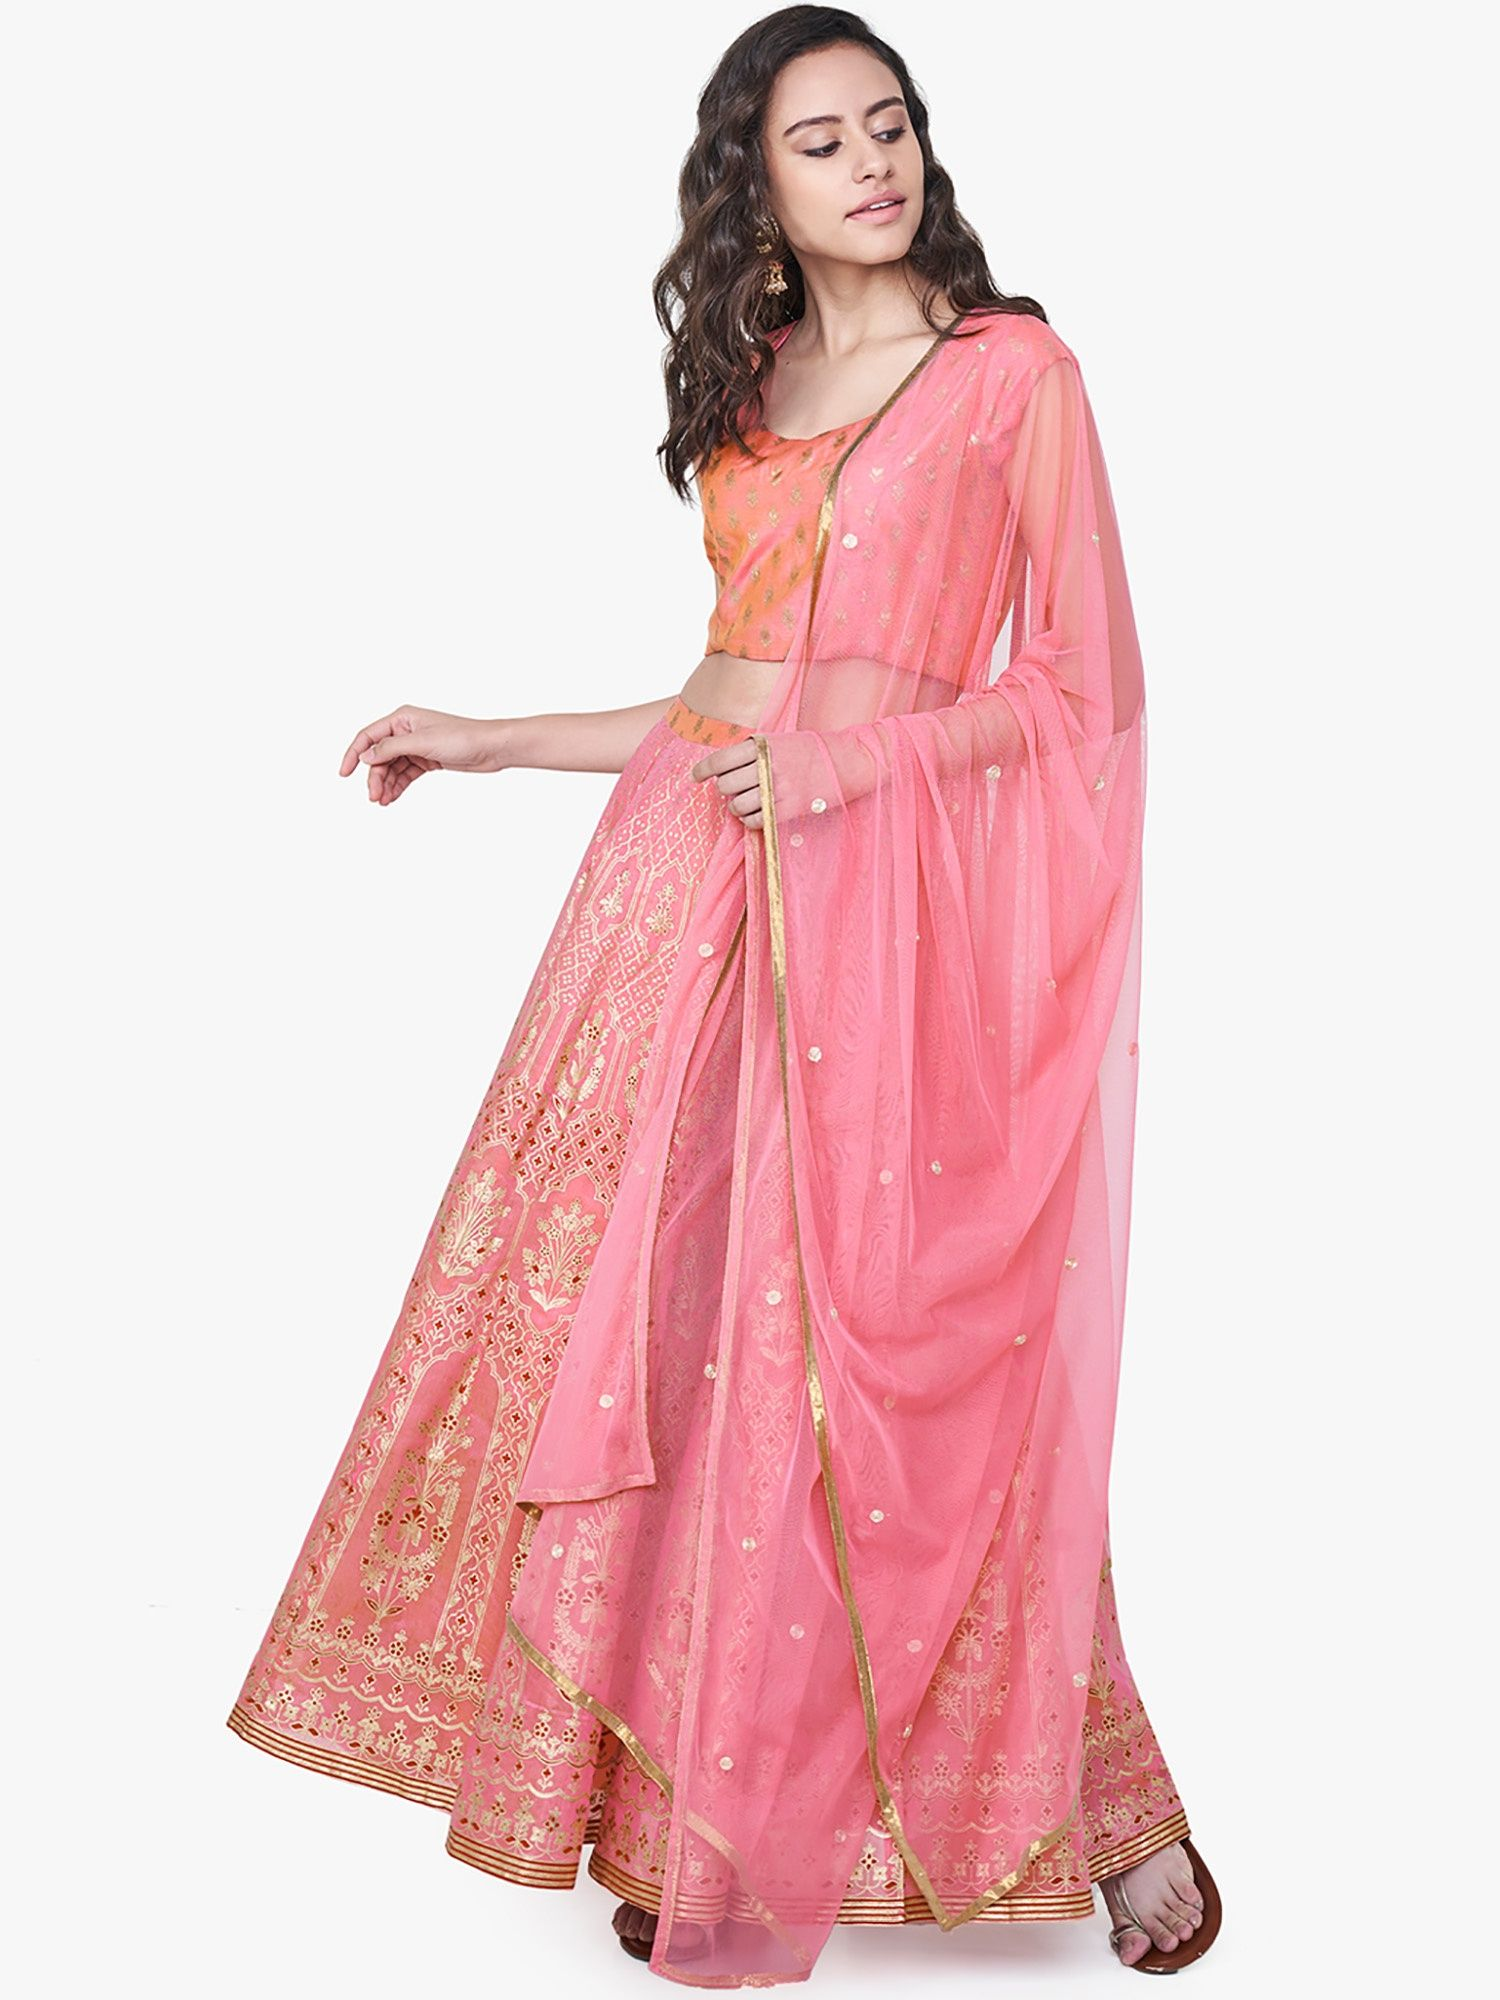 6ab305a67e85f Global Desi Kurtas : Buy Global Desi Pink Floral Print Lehenga Sets ...